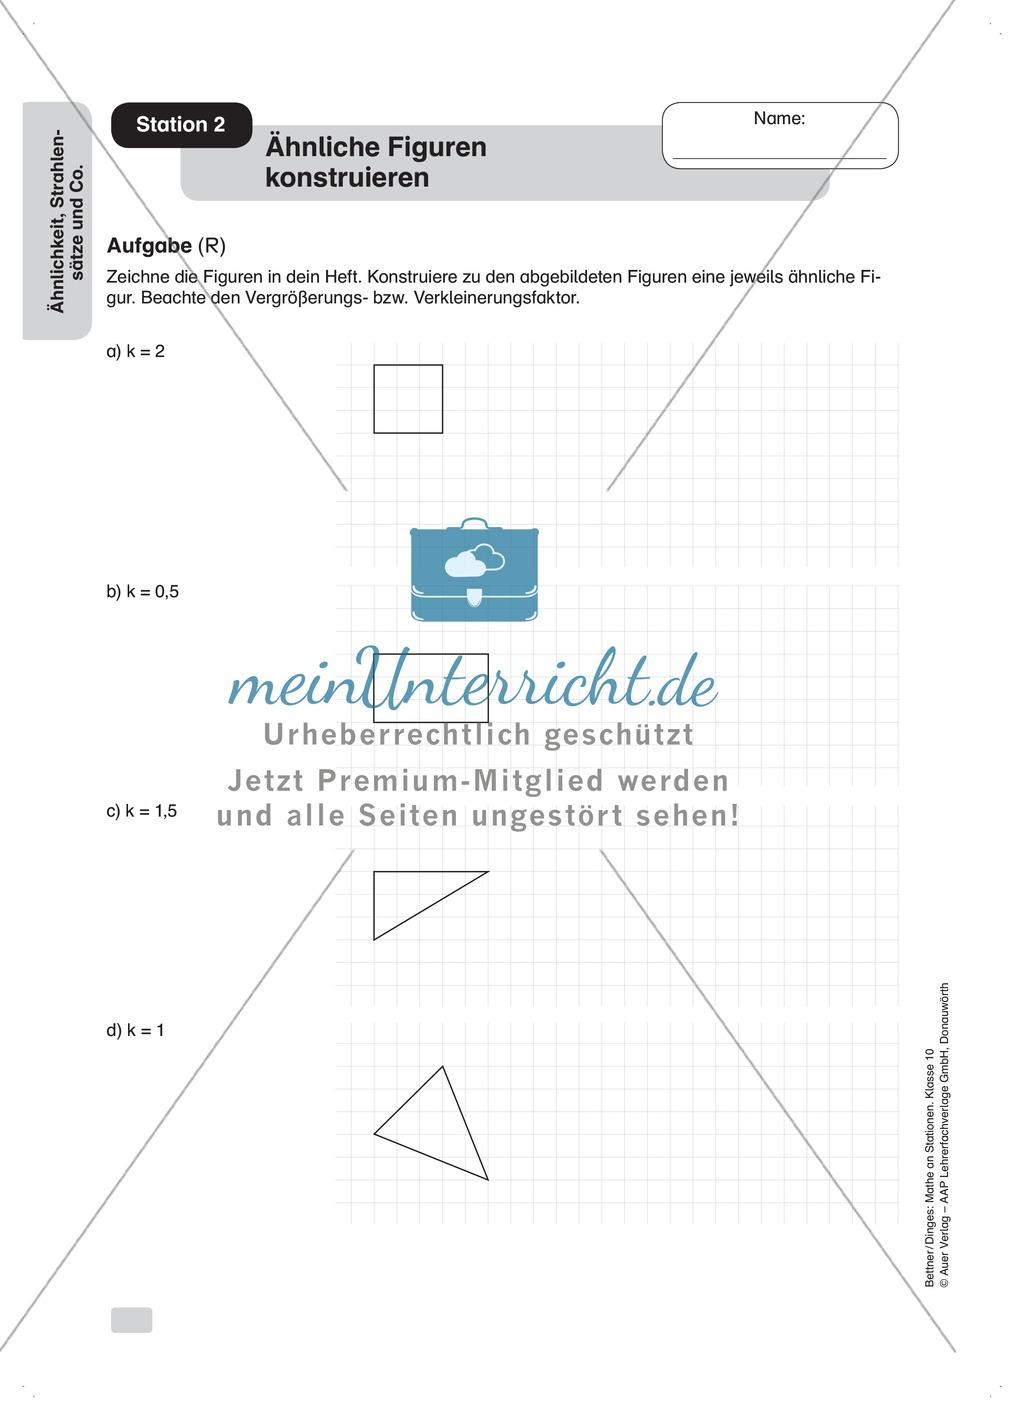 Beautiful ähnliche Formen Arbeitsblatt Gift - Mathe Arbeitsblatt ...